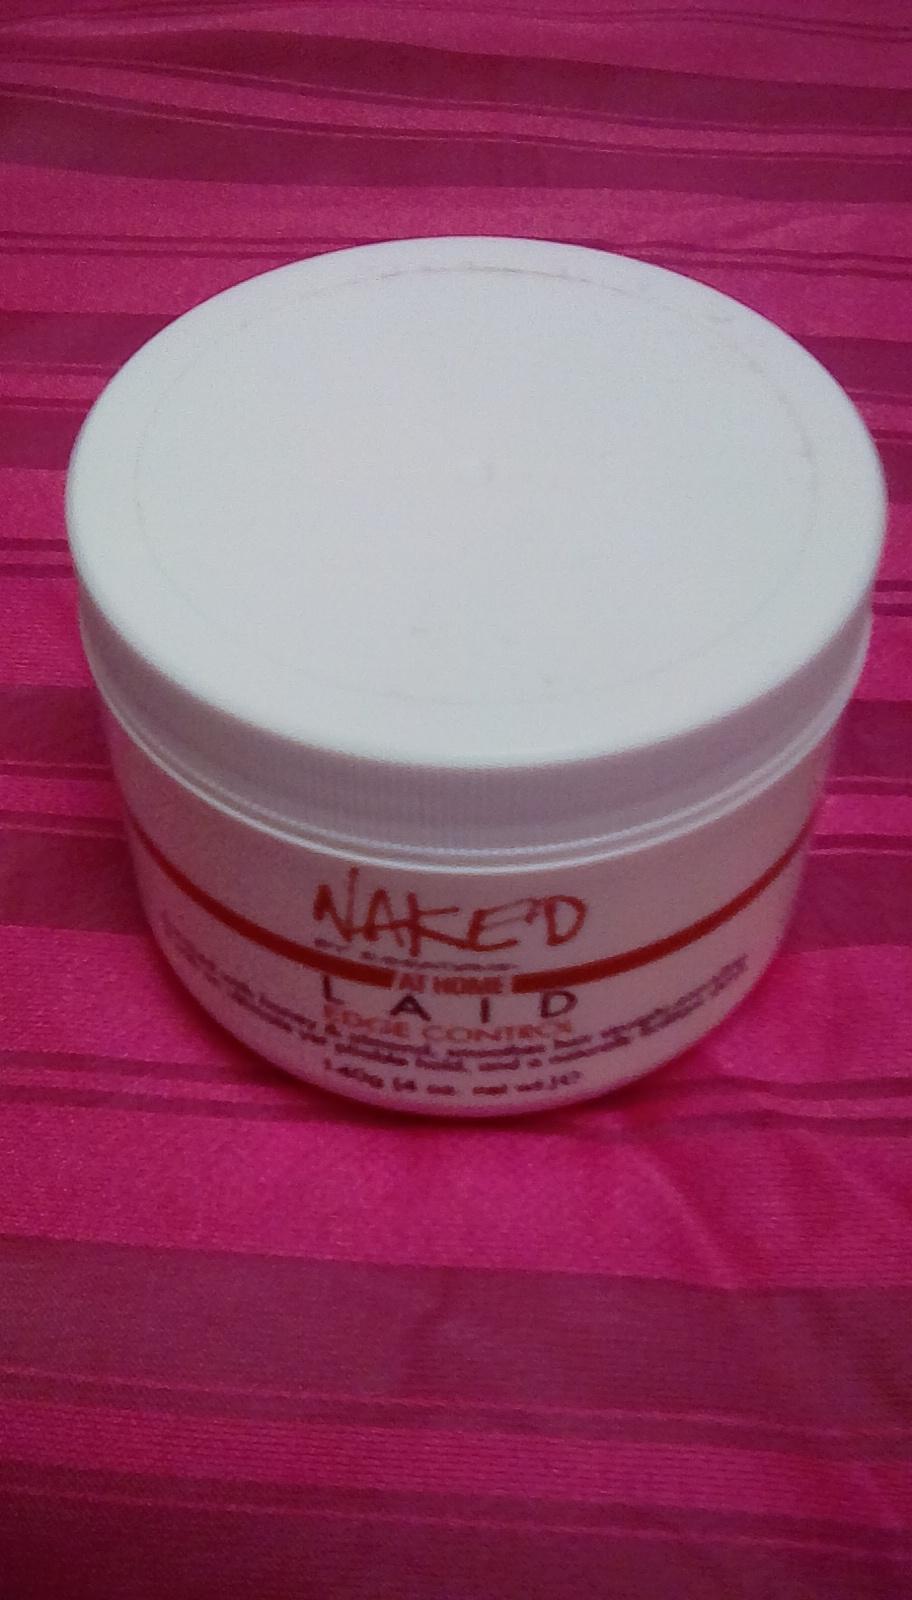 Naked Laid Edge Control